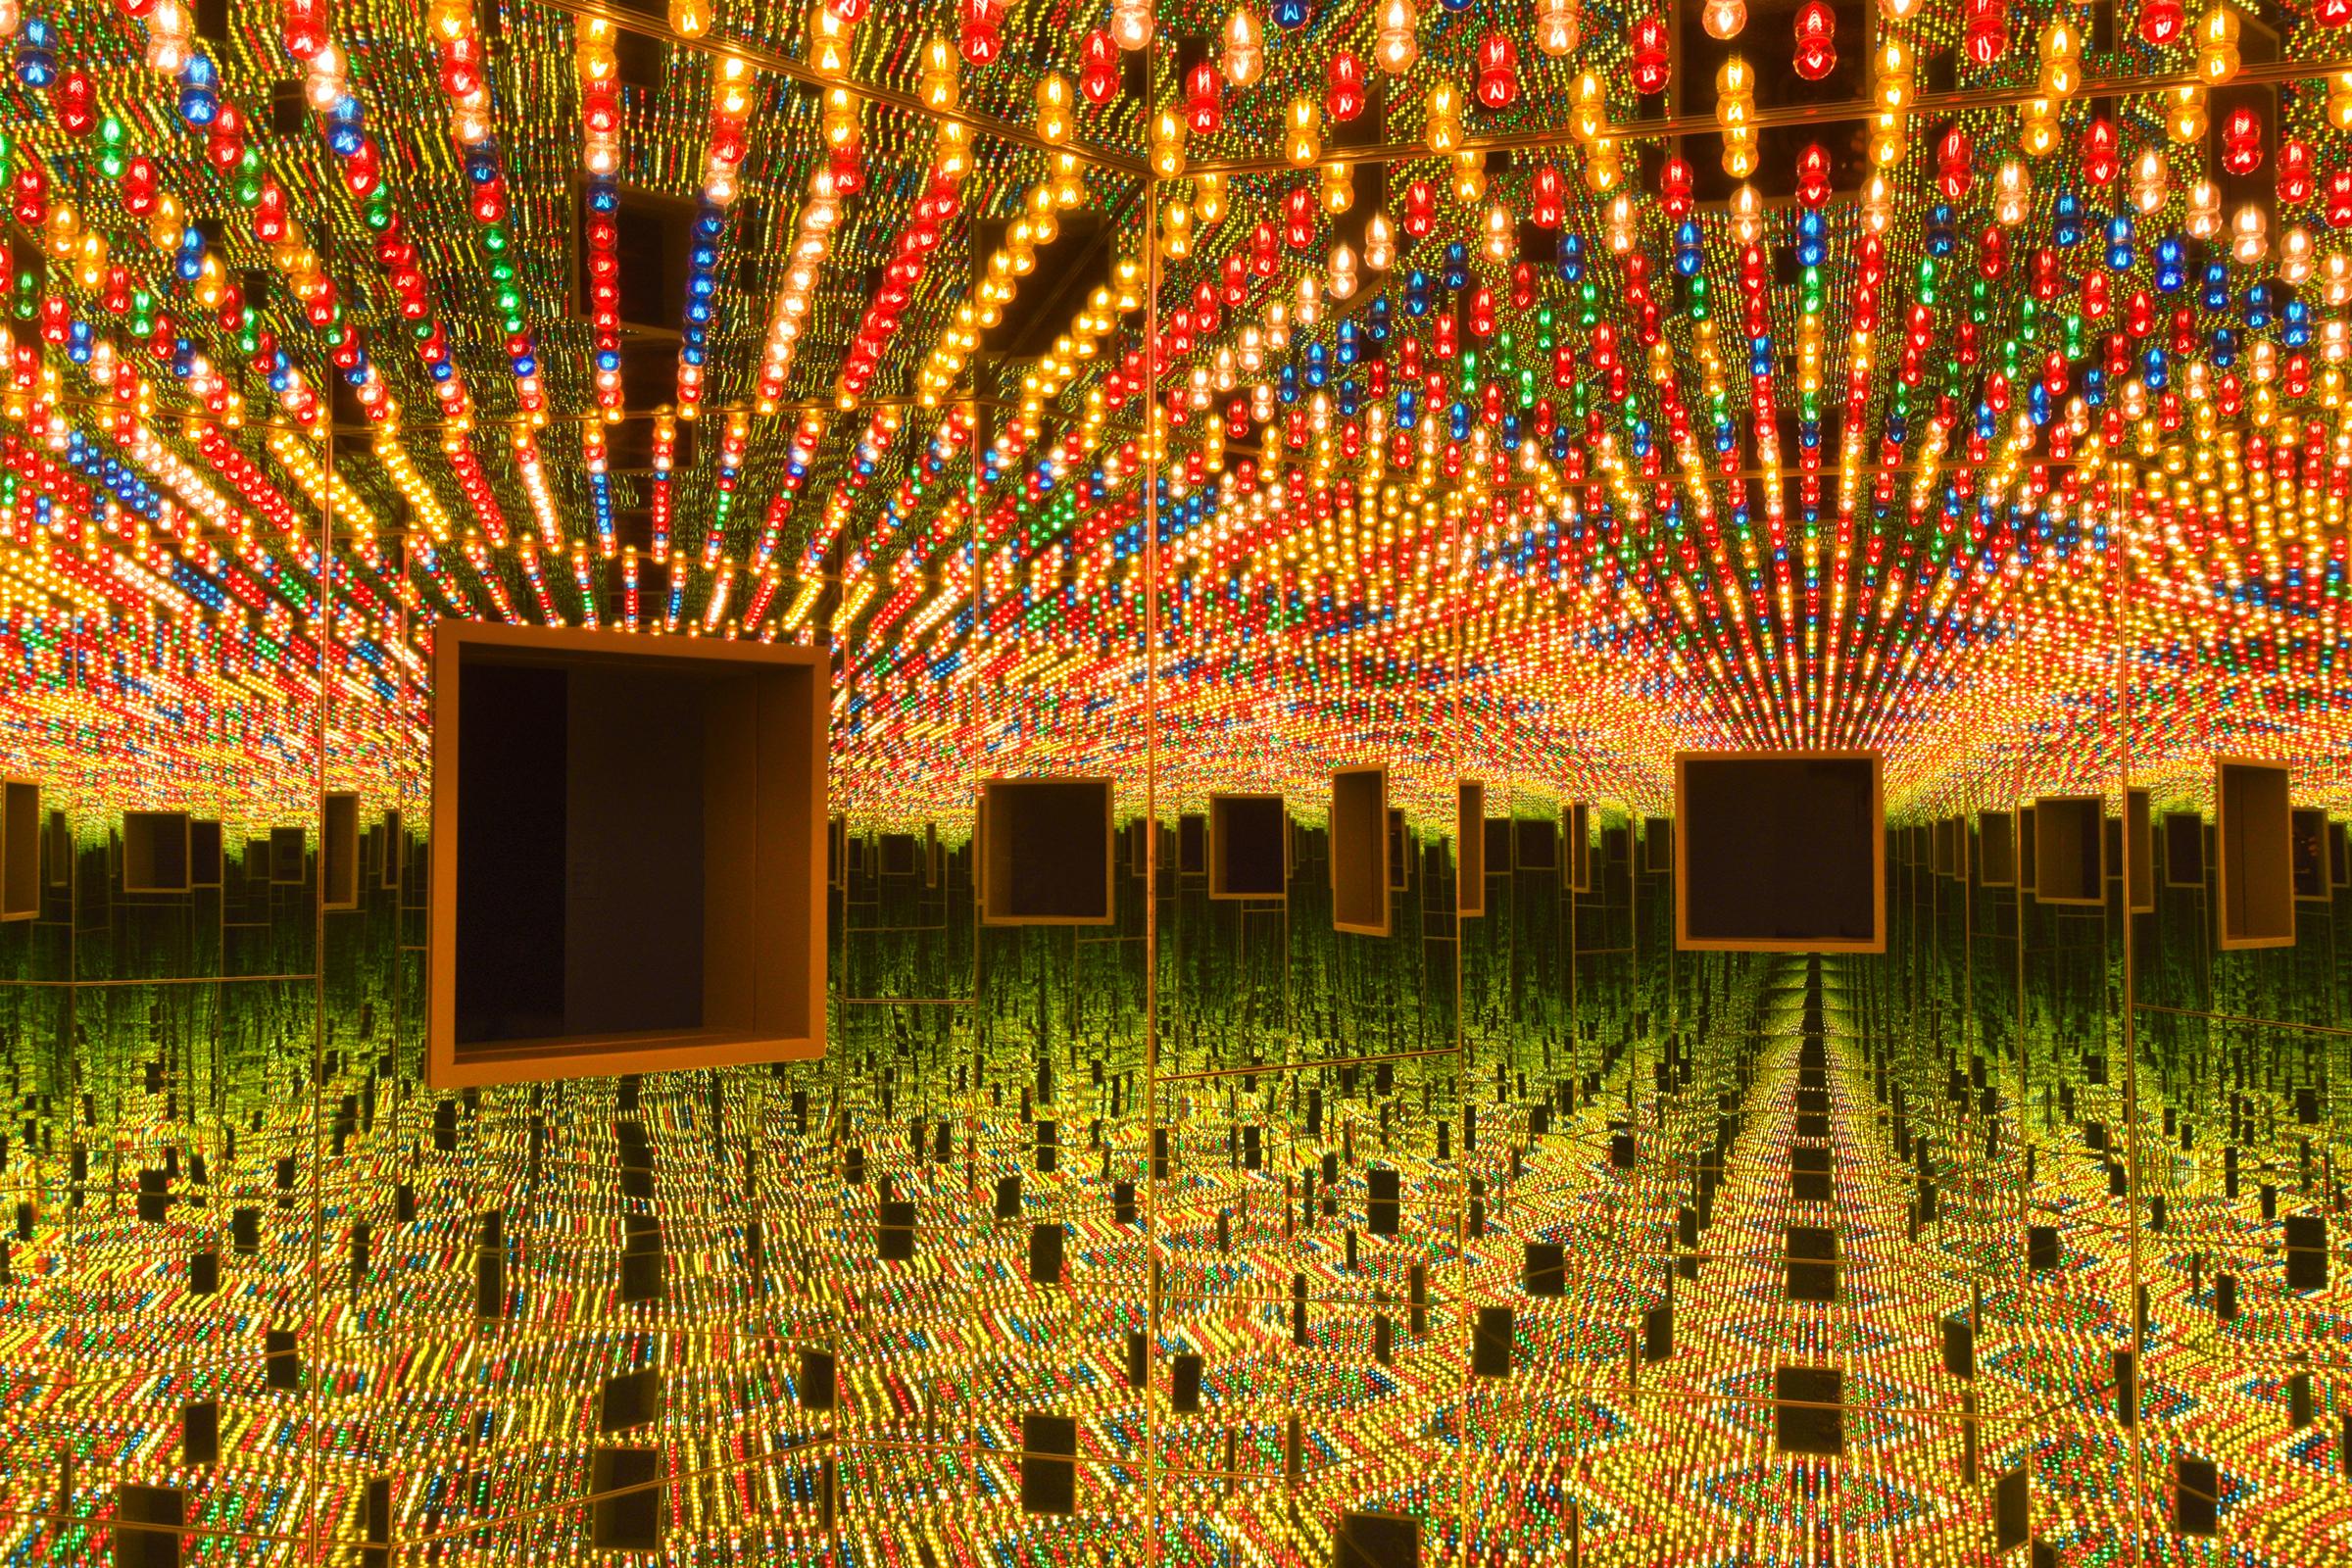 Kusama's 'Infinity Mirrors' a Vibrant Respite From Reality